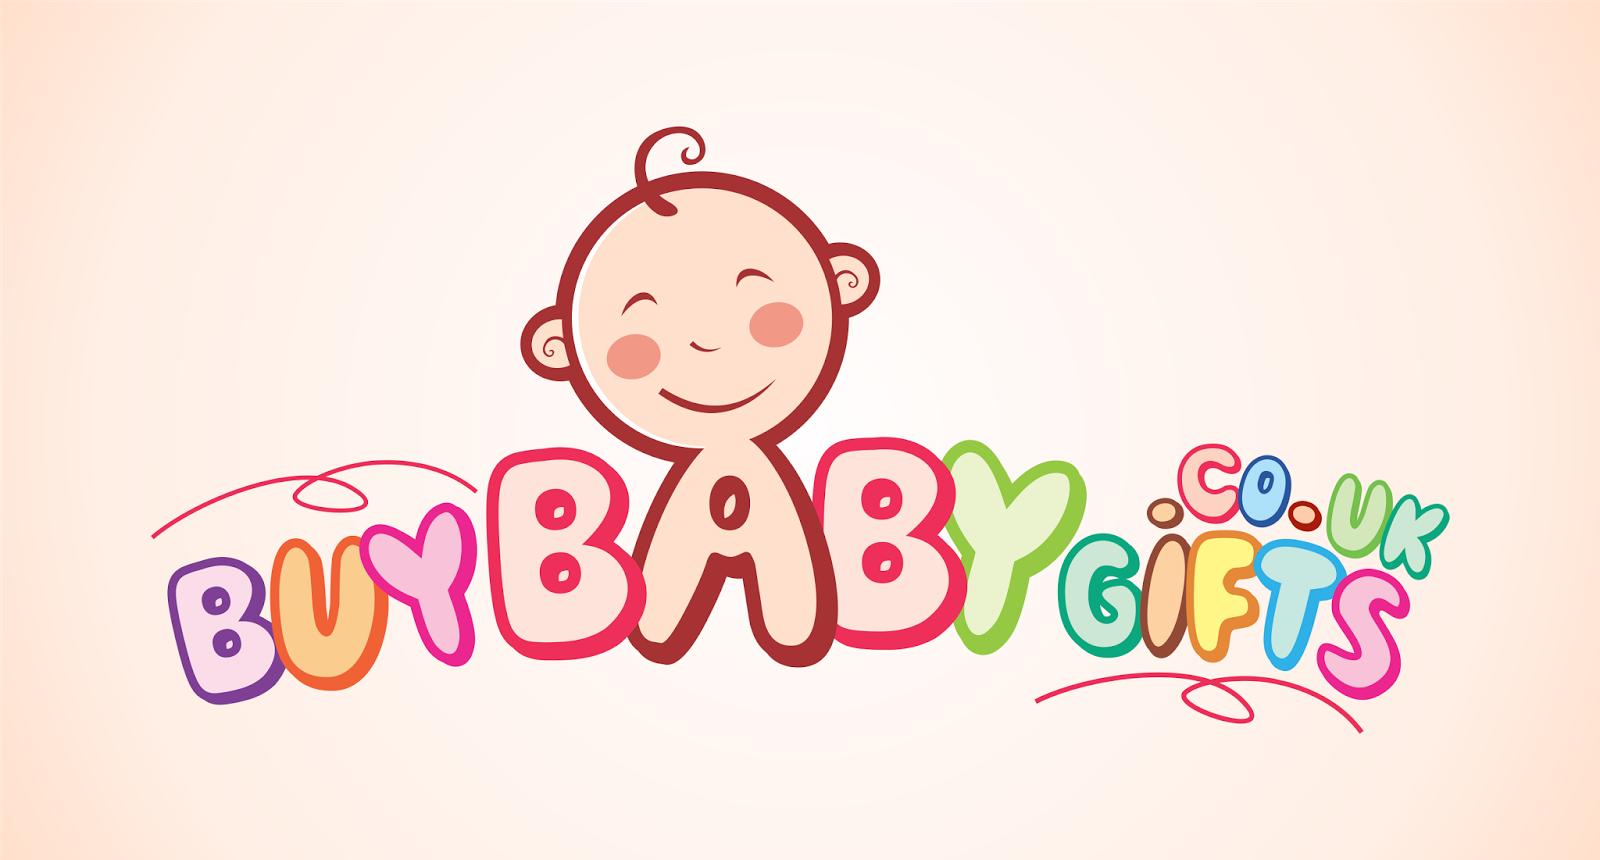 Baby Gift Logo : Freelance graphic designer buy baby gifts logo design